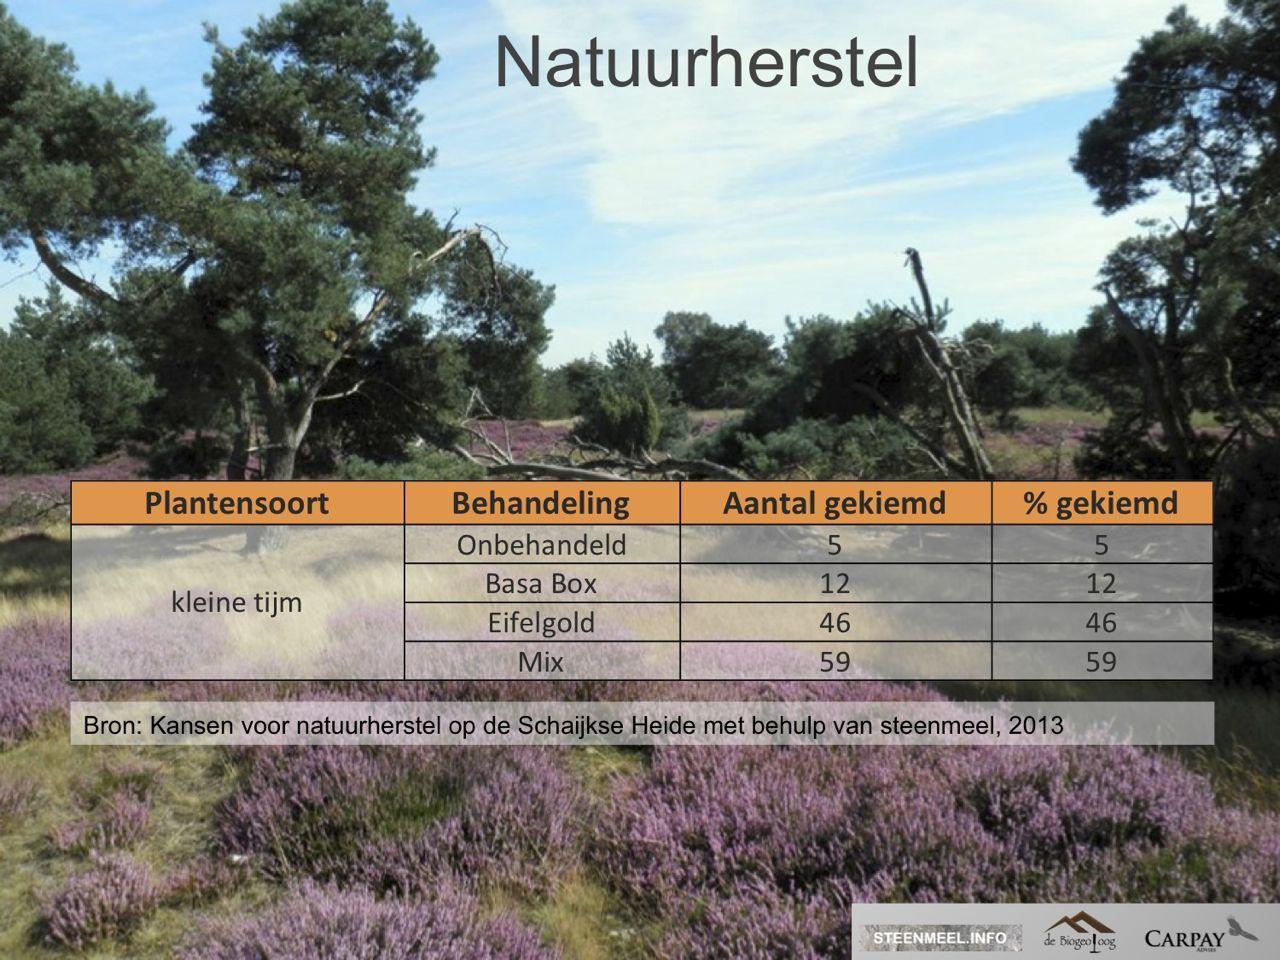 Eifelgold natuurherstel